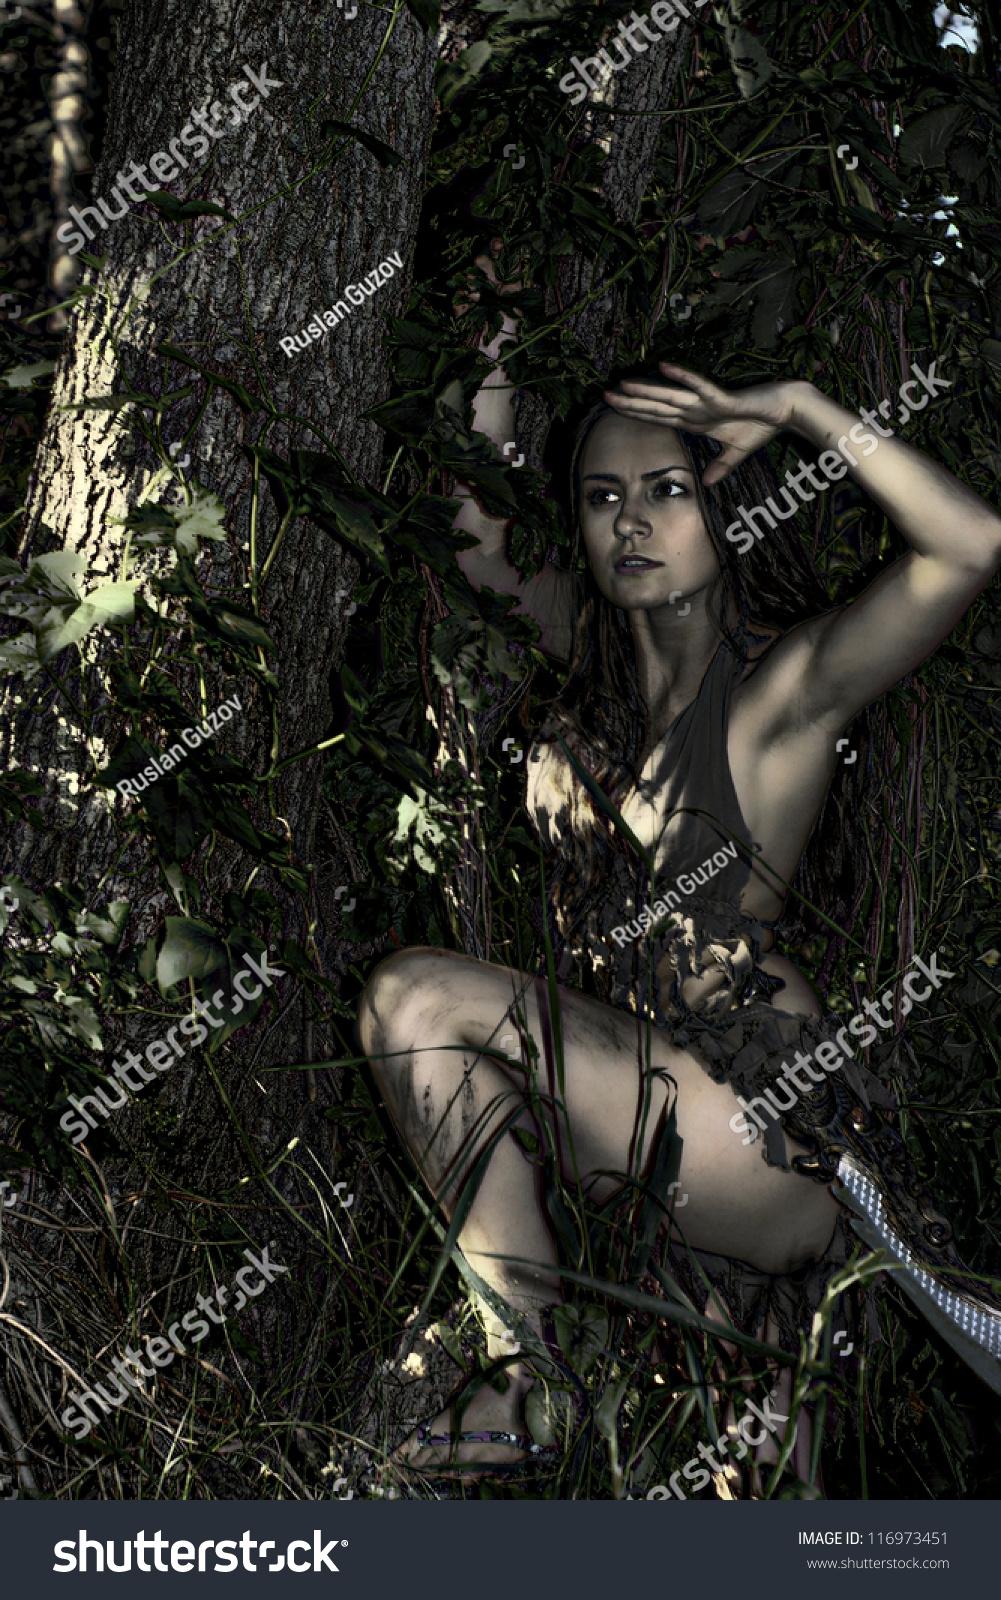 girl in loincloth stock - photo #27